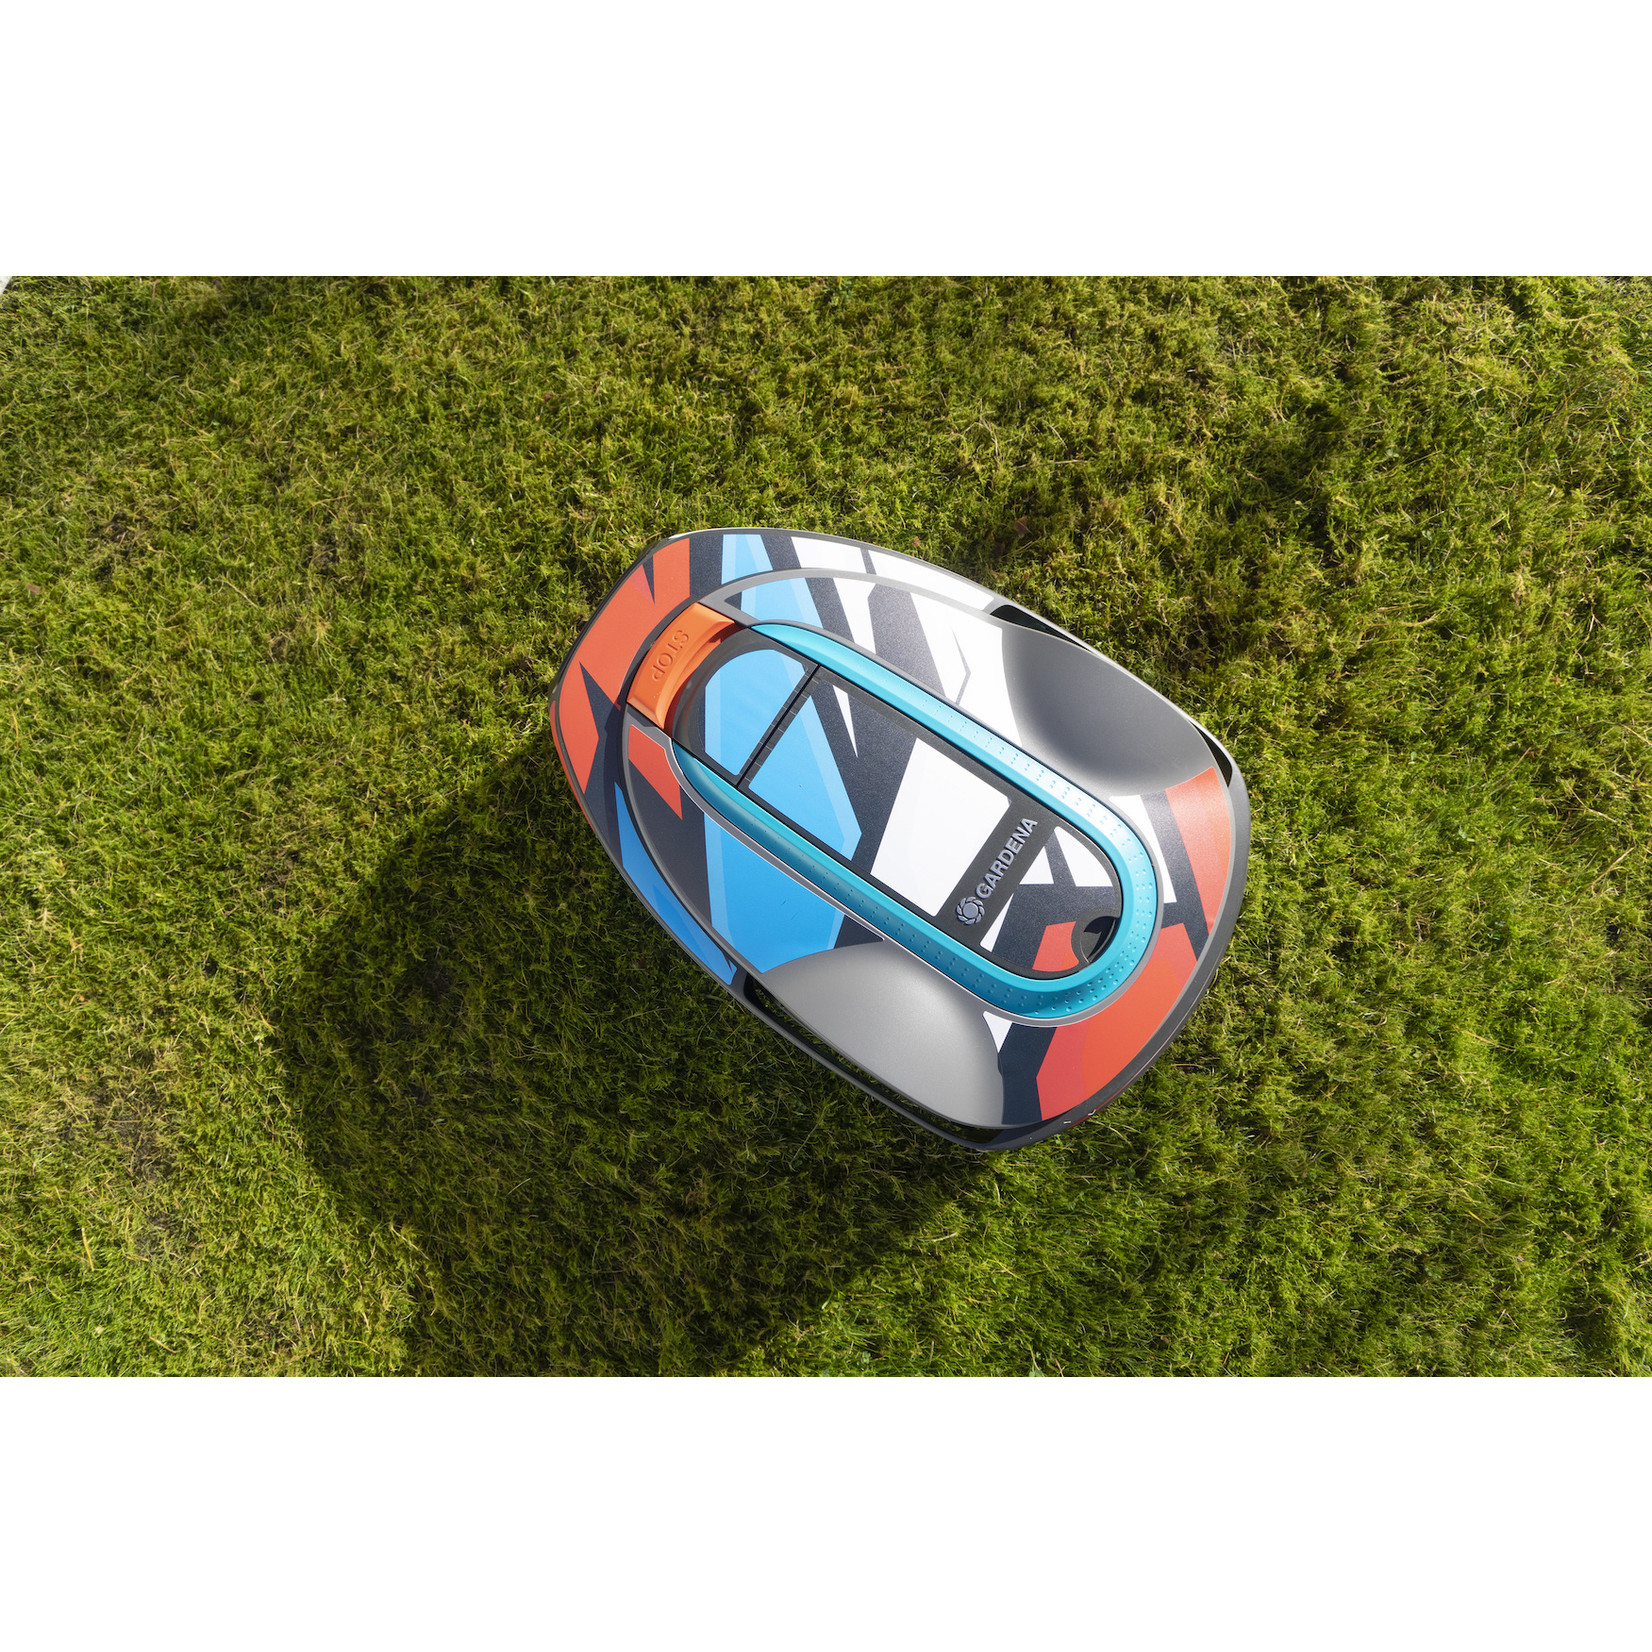 Twinckels Twinckels robotmaaier stickerset (Gardena Sileno) - RWB Patroon